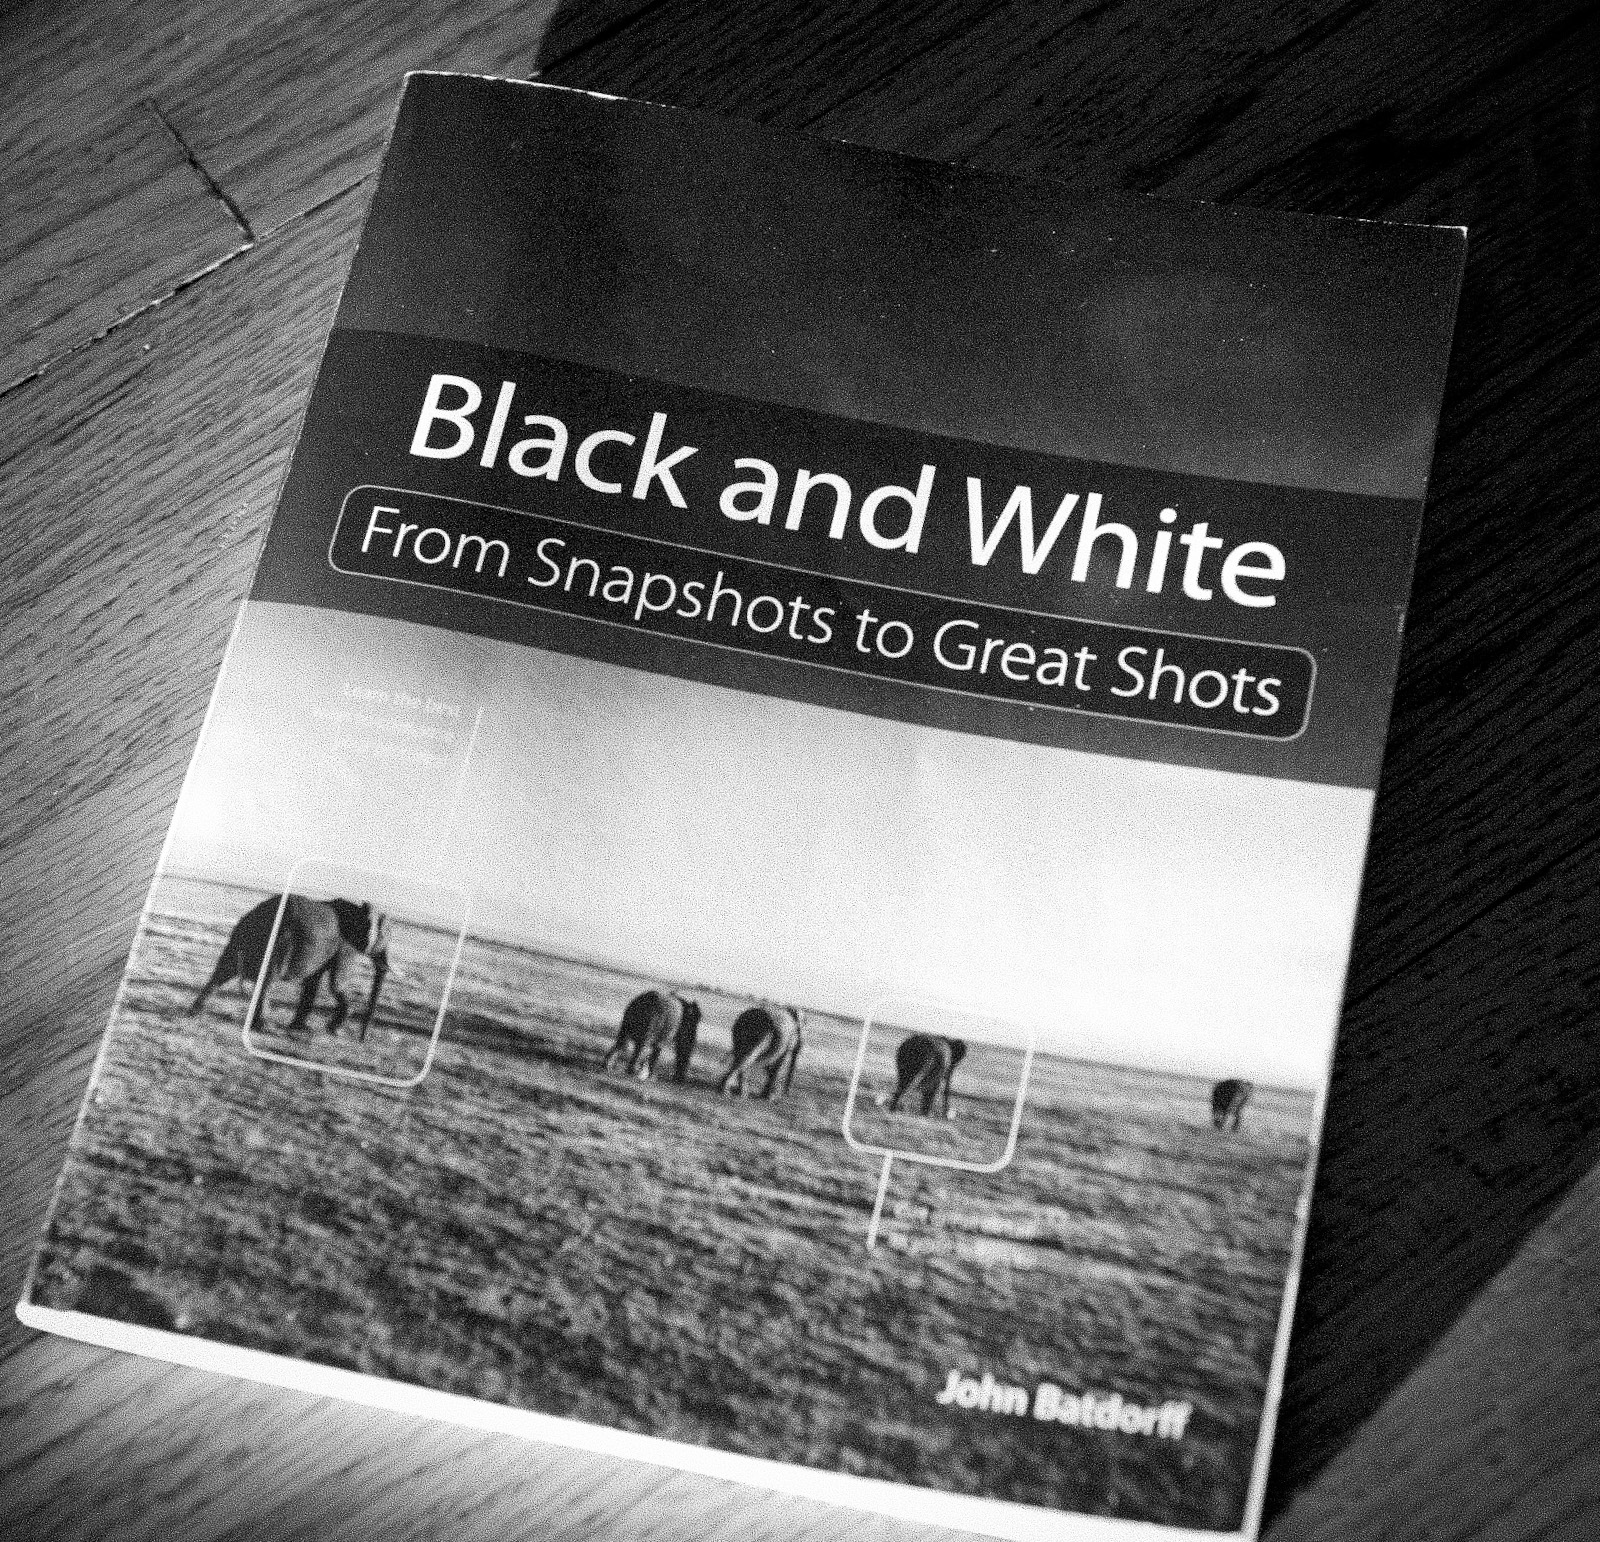 John Batdorff's Black and White: From Snapshots to Great Shots